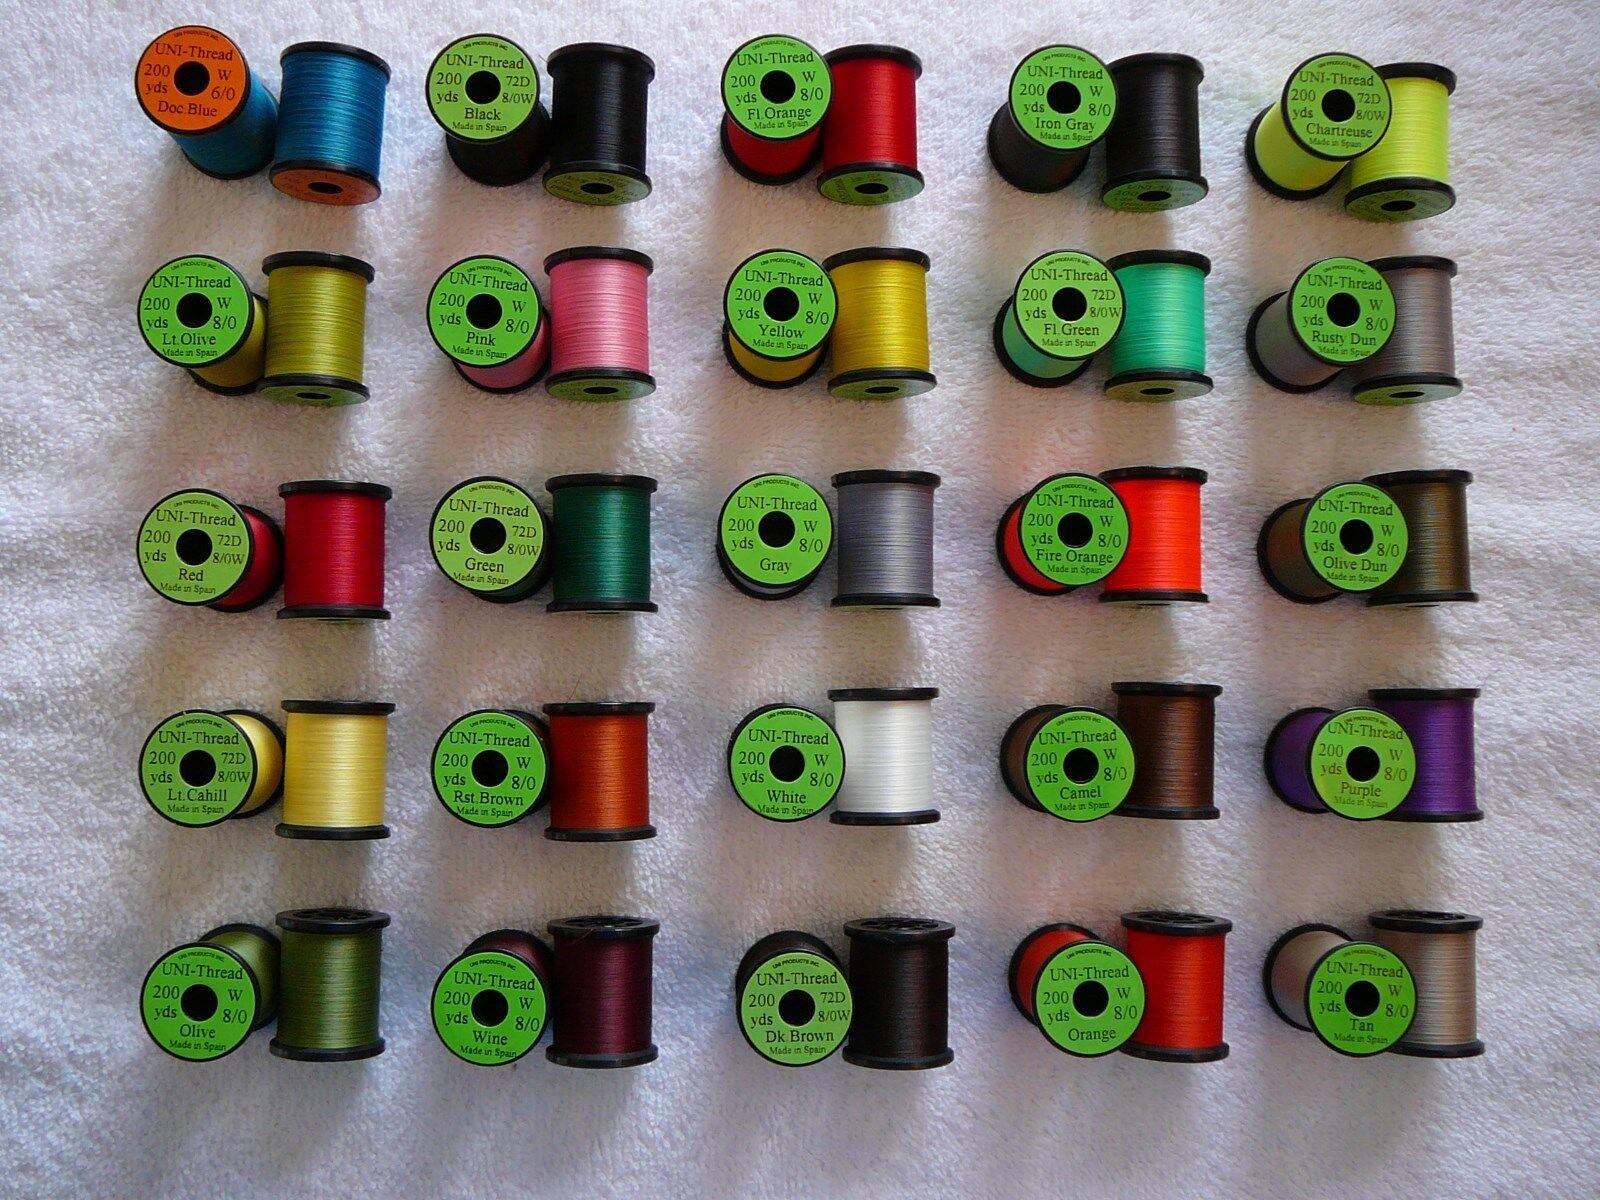 Uni-Thread Combo   8 0.. 200 yd Spool...Fly  Tying, Floss, Yarn, Tinsel, Mohair.  wholesale price